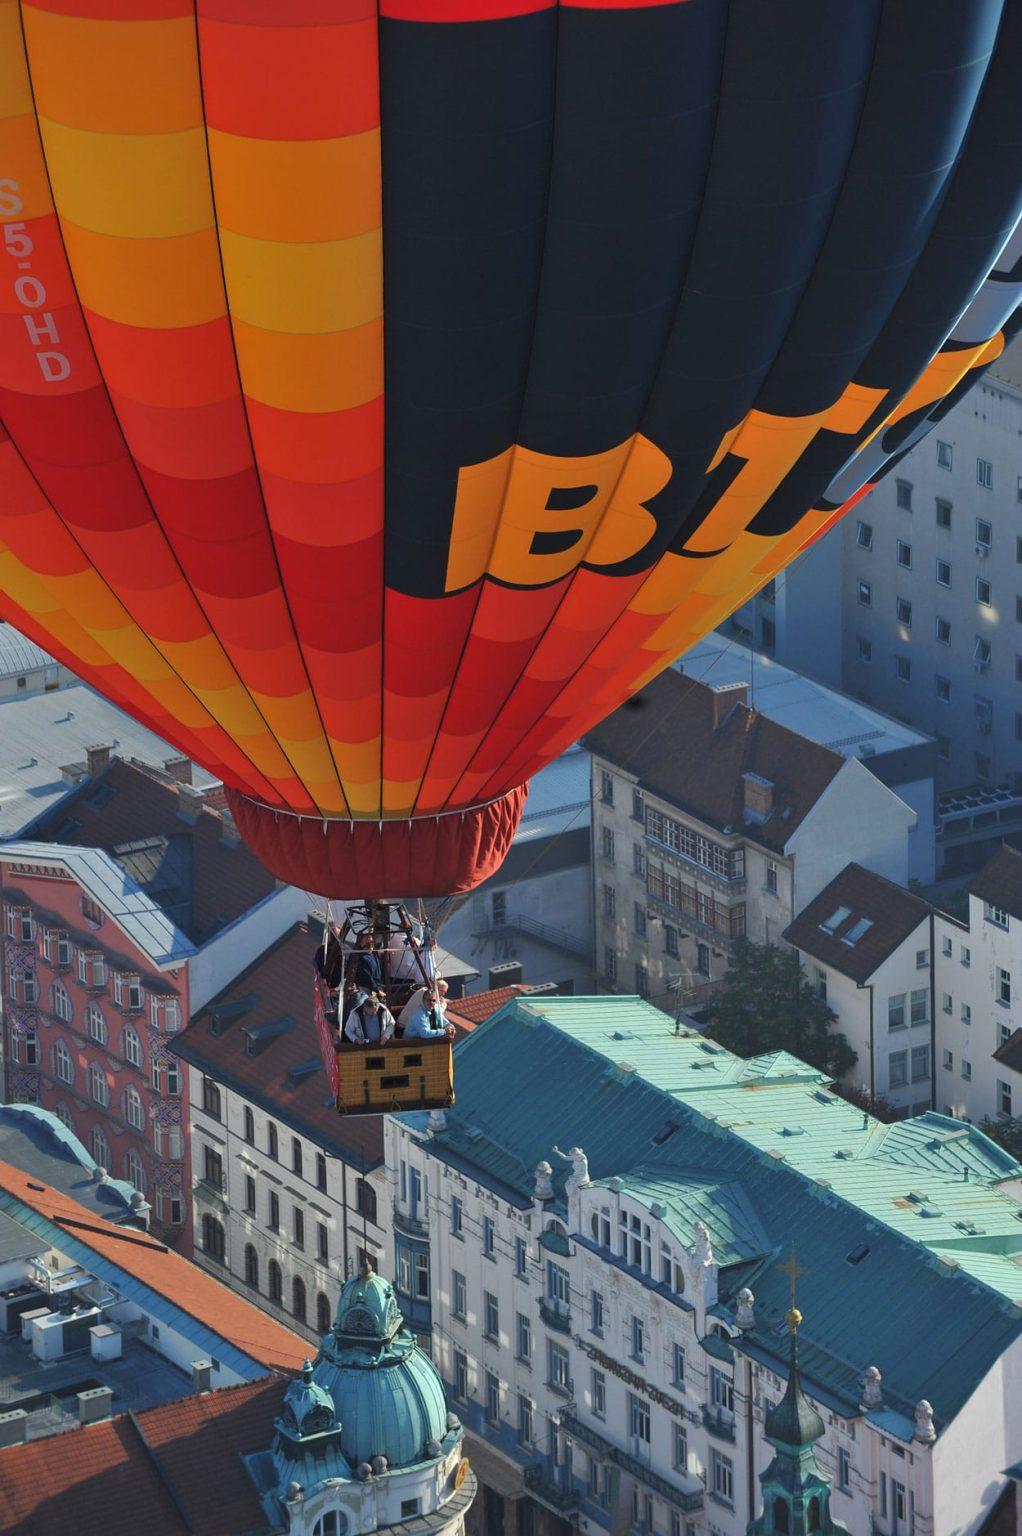 Hot-air-balloon-flight-ljubljana